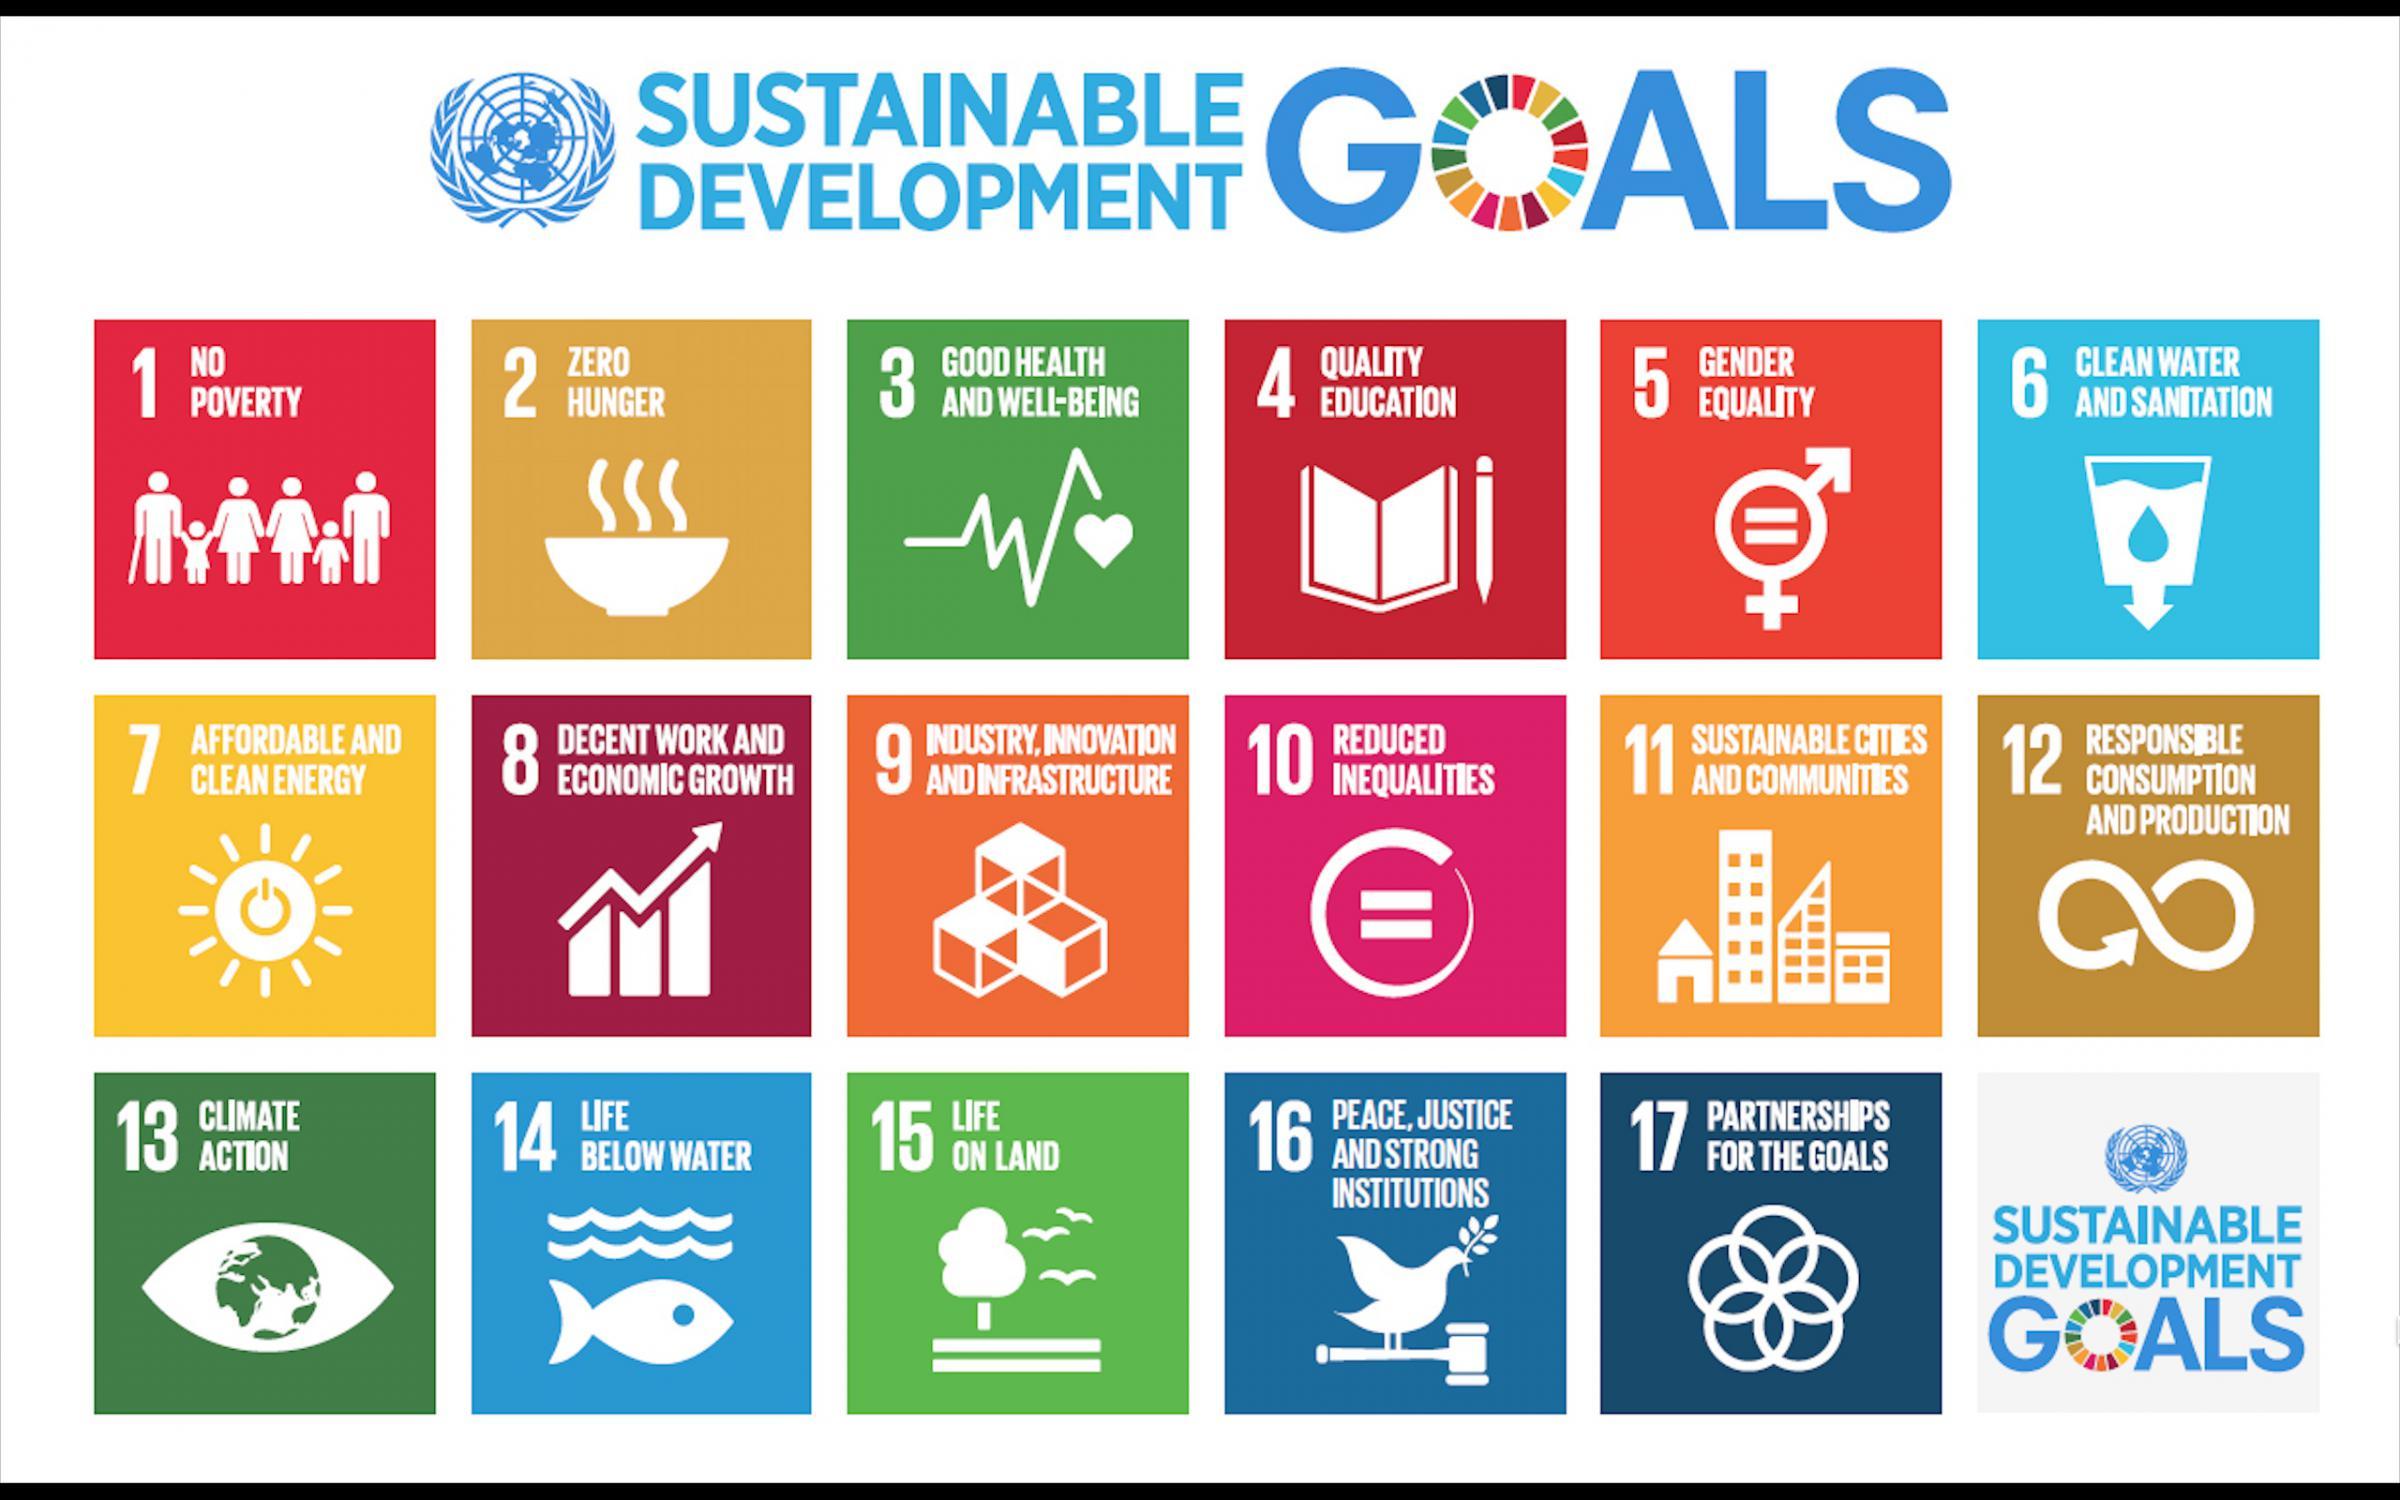 Sustainable Development Goals - Agenda 2030